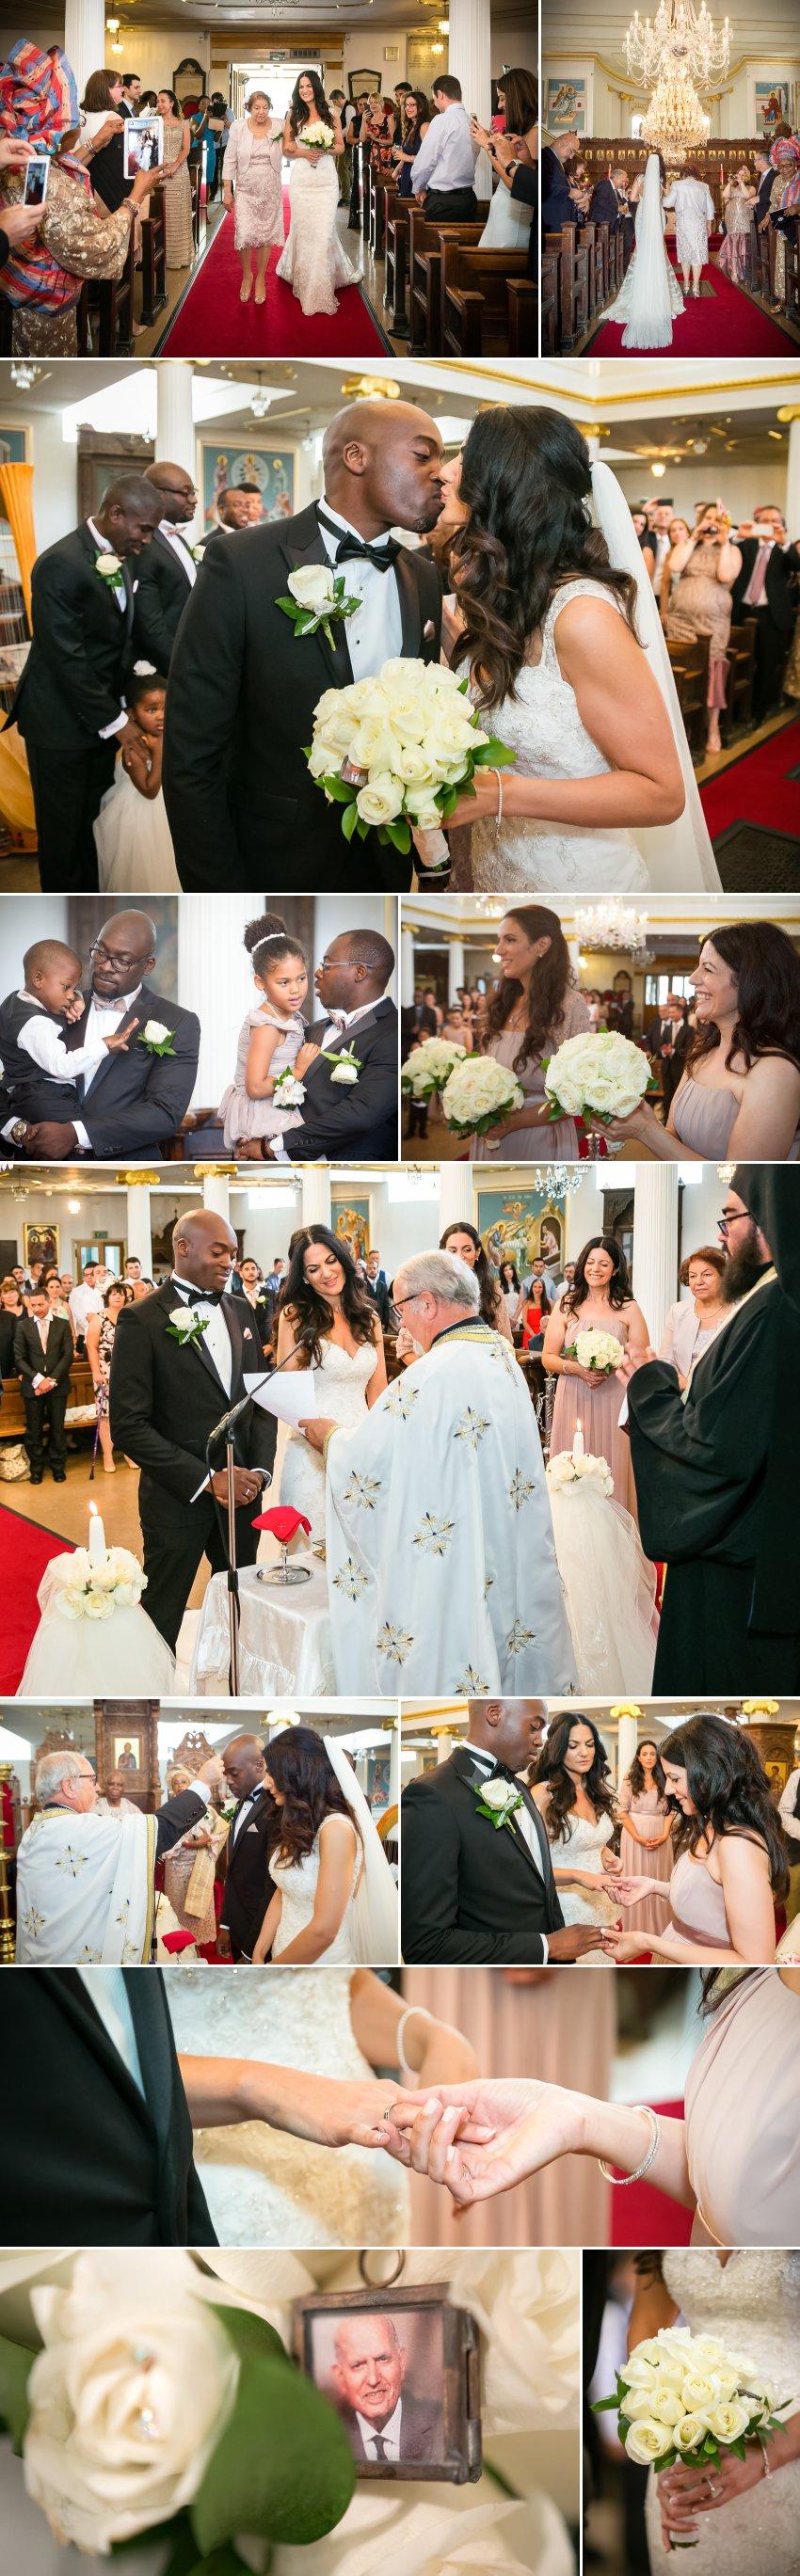 08 Nigerian wedding at Rosewood Hotel